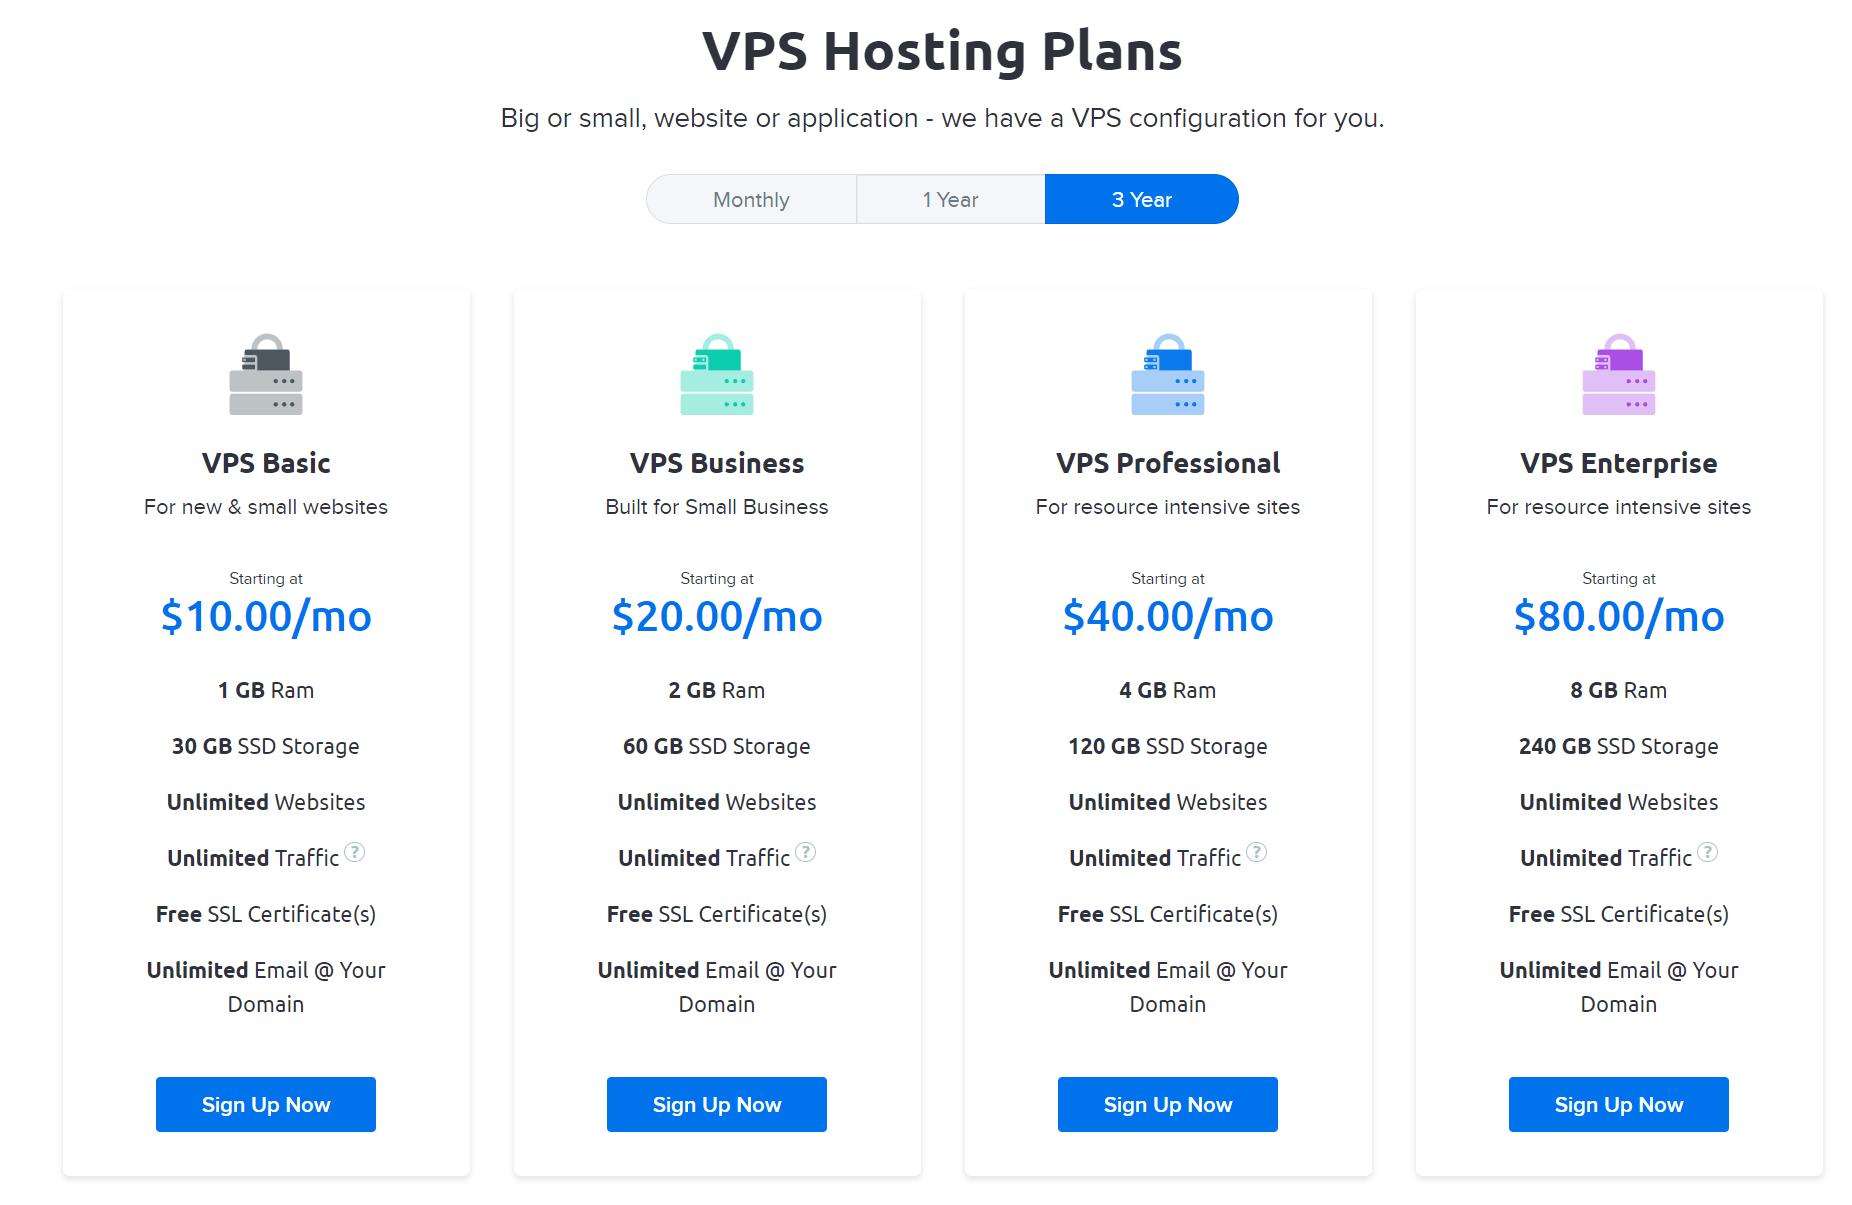 DreamHost-VPS-hosting-review-prijzen